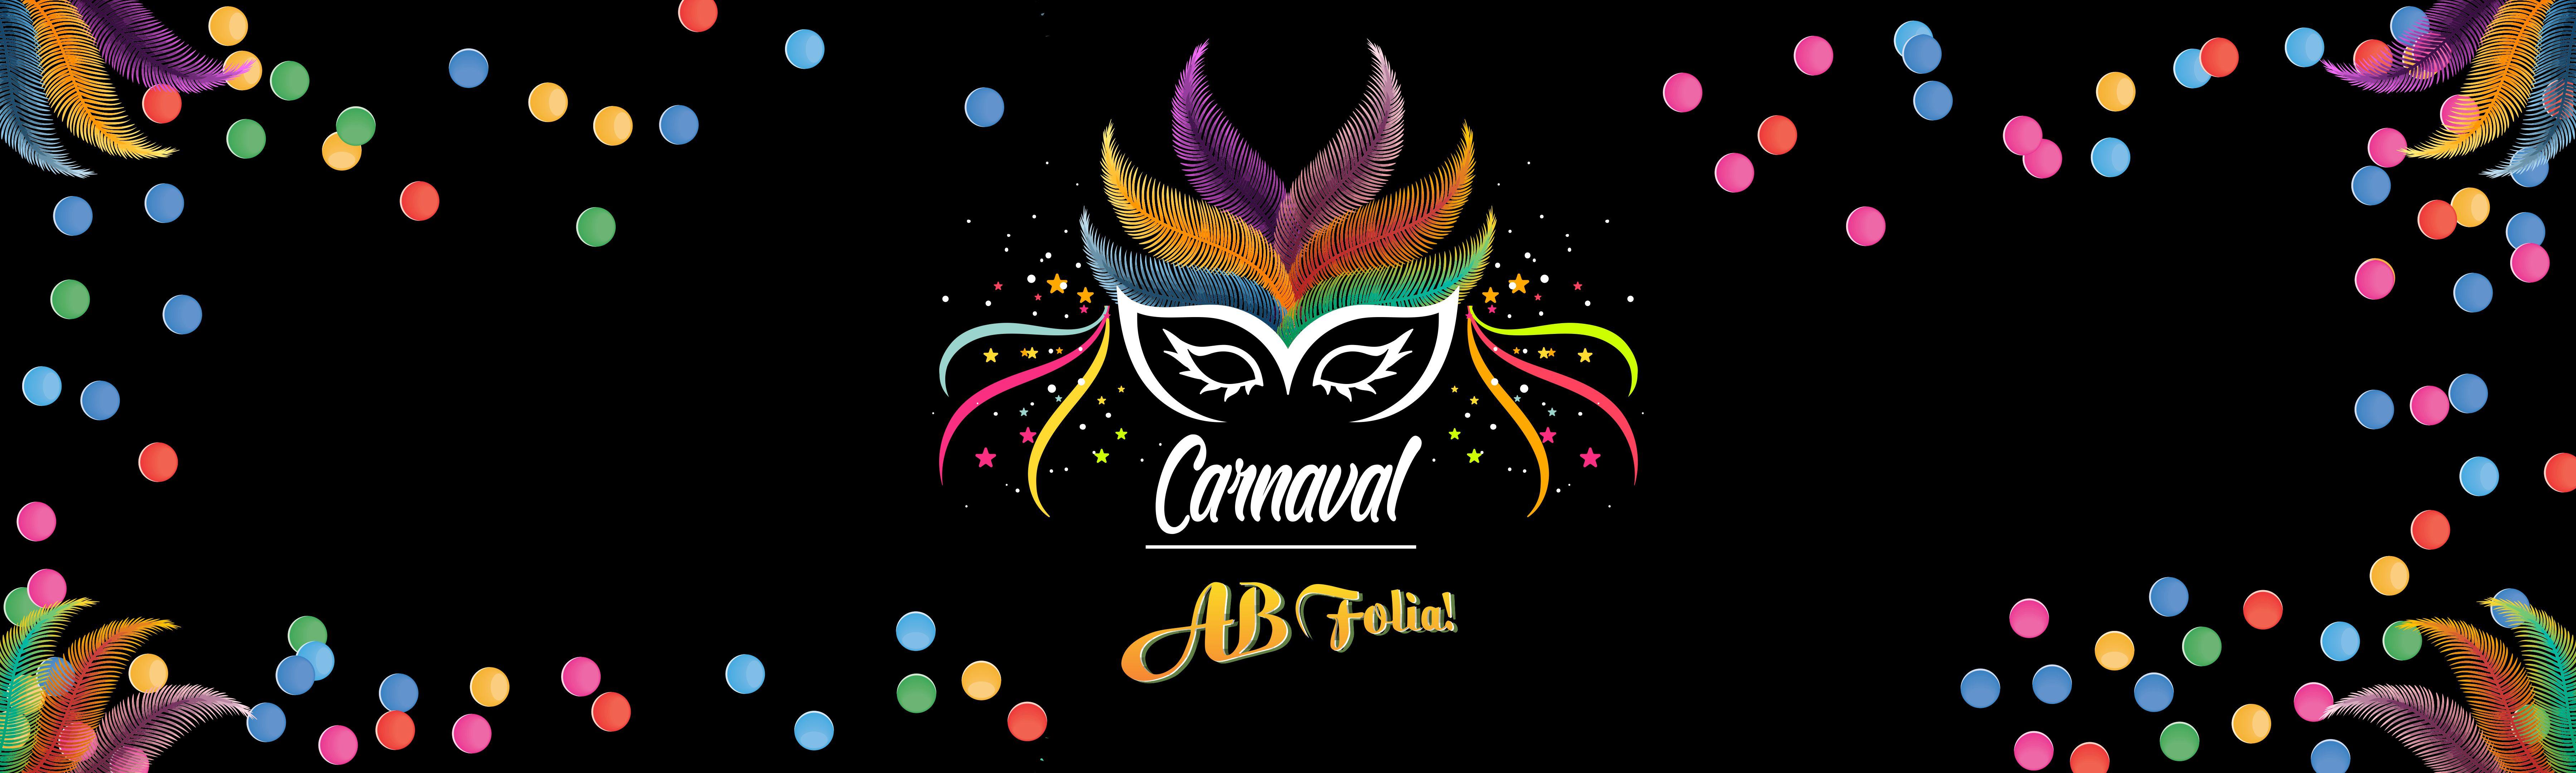 Carnaval 2018 – Fotos